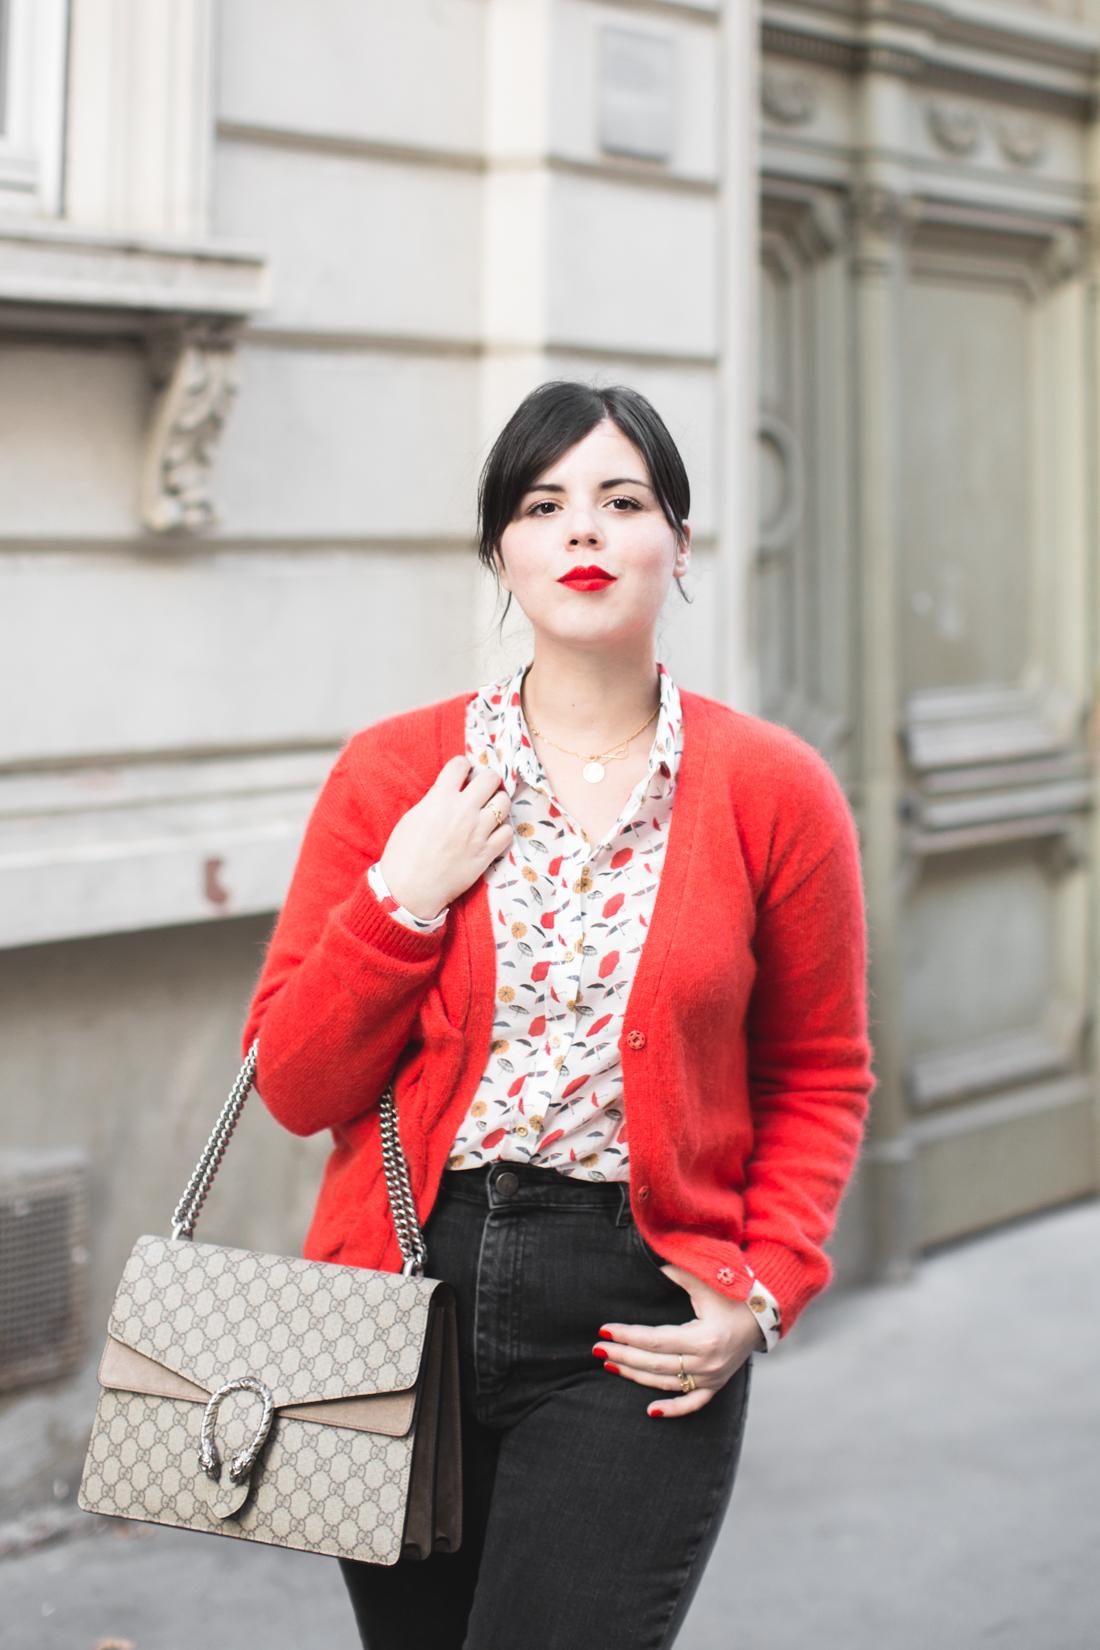 sezane-chemise-imprimee-valentina-curry-copyright-pauline-paulinefashionblog-com-8